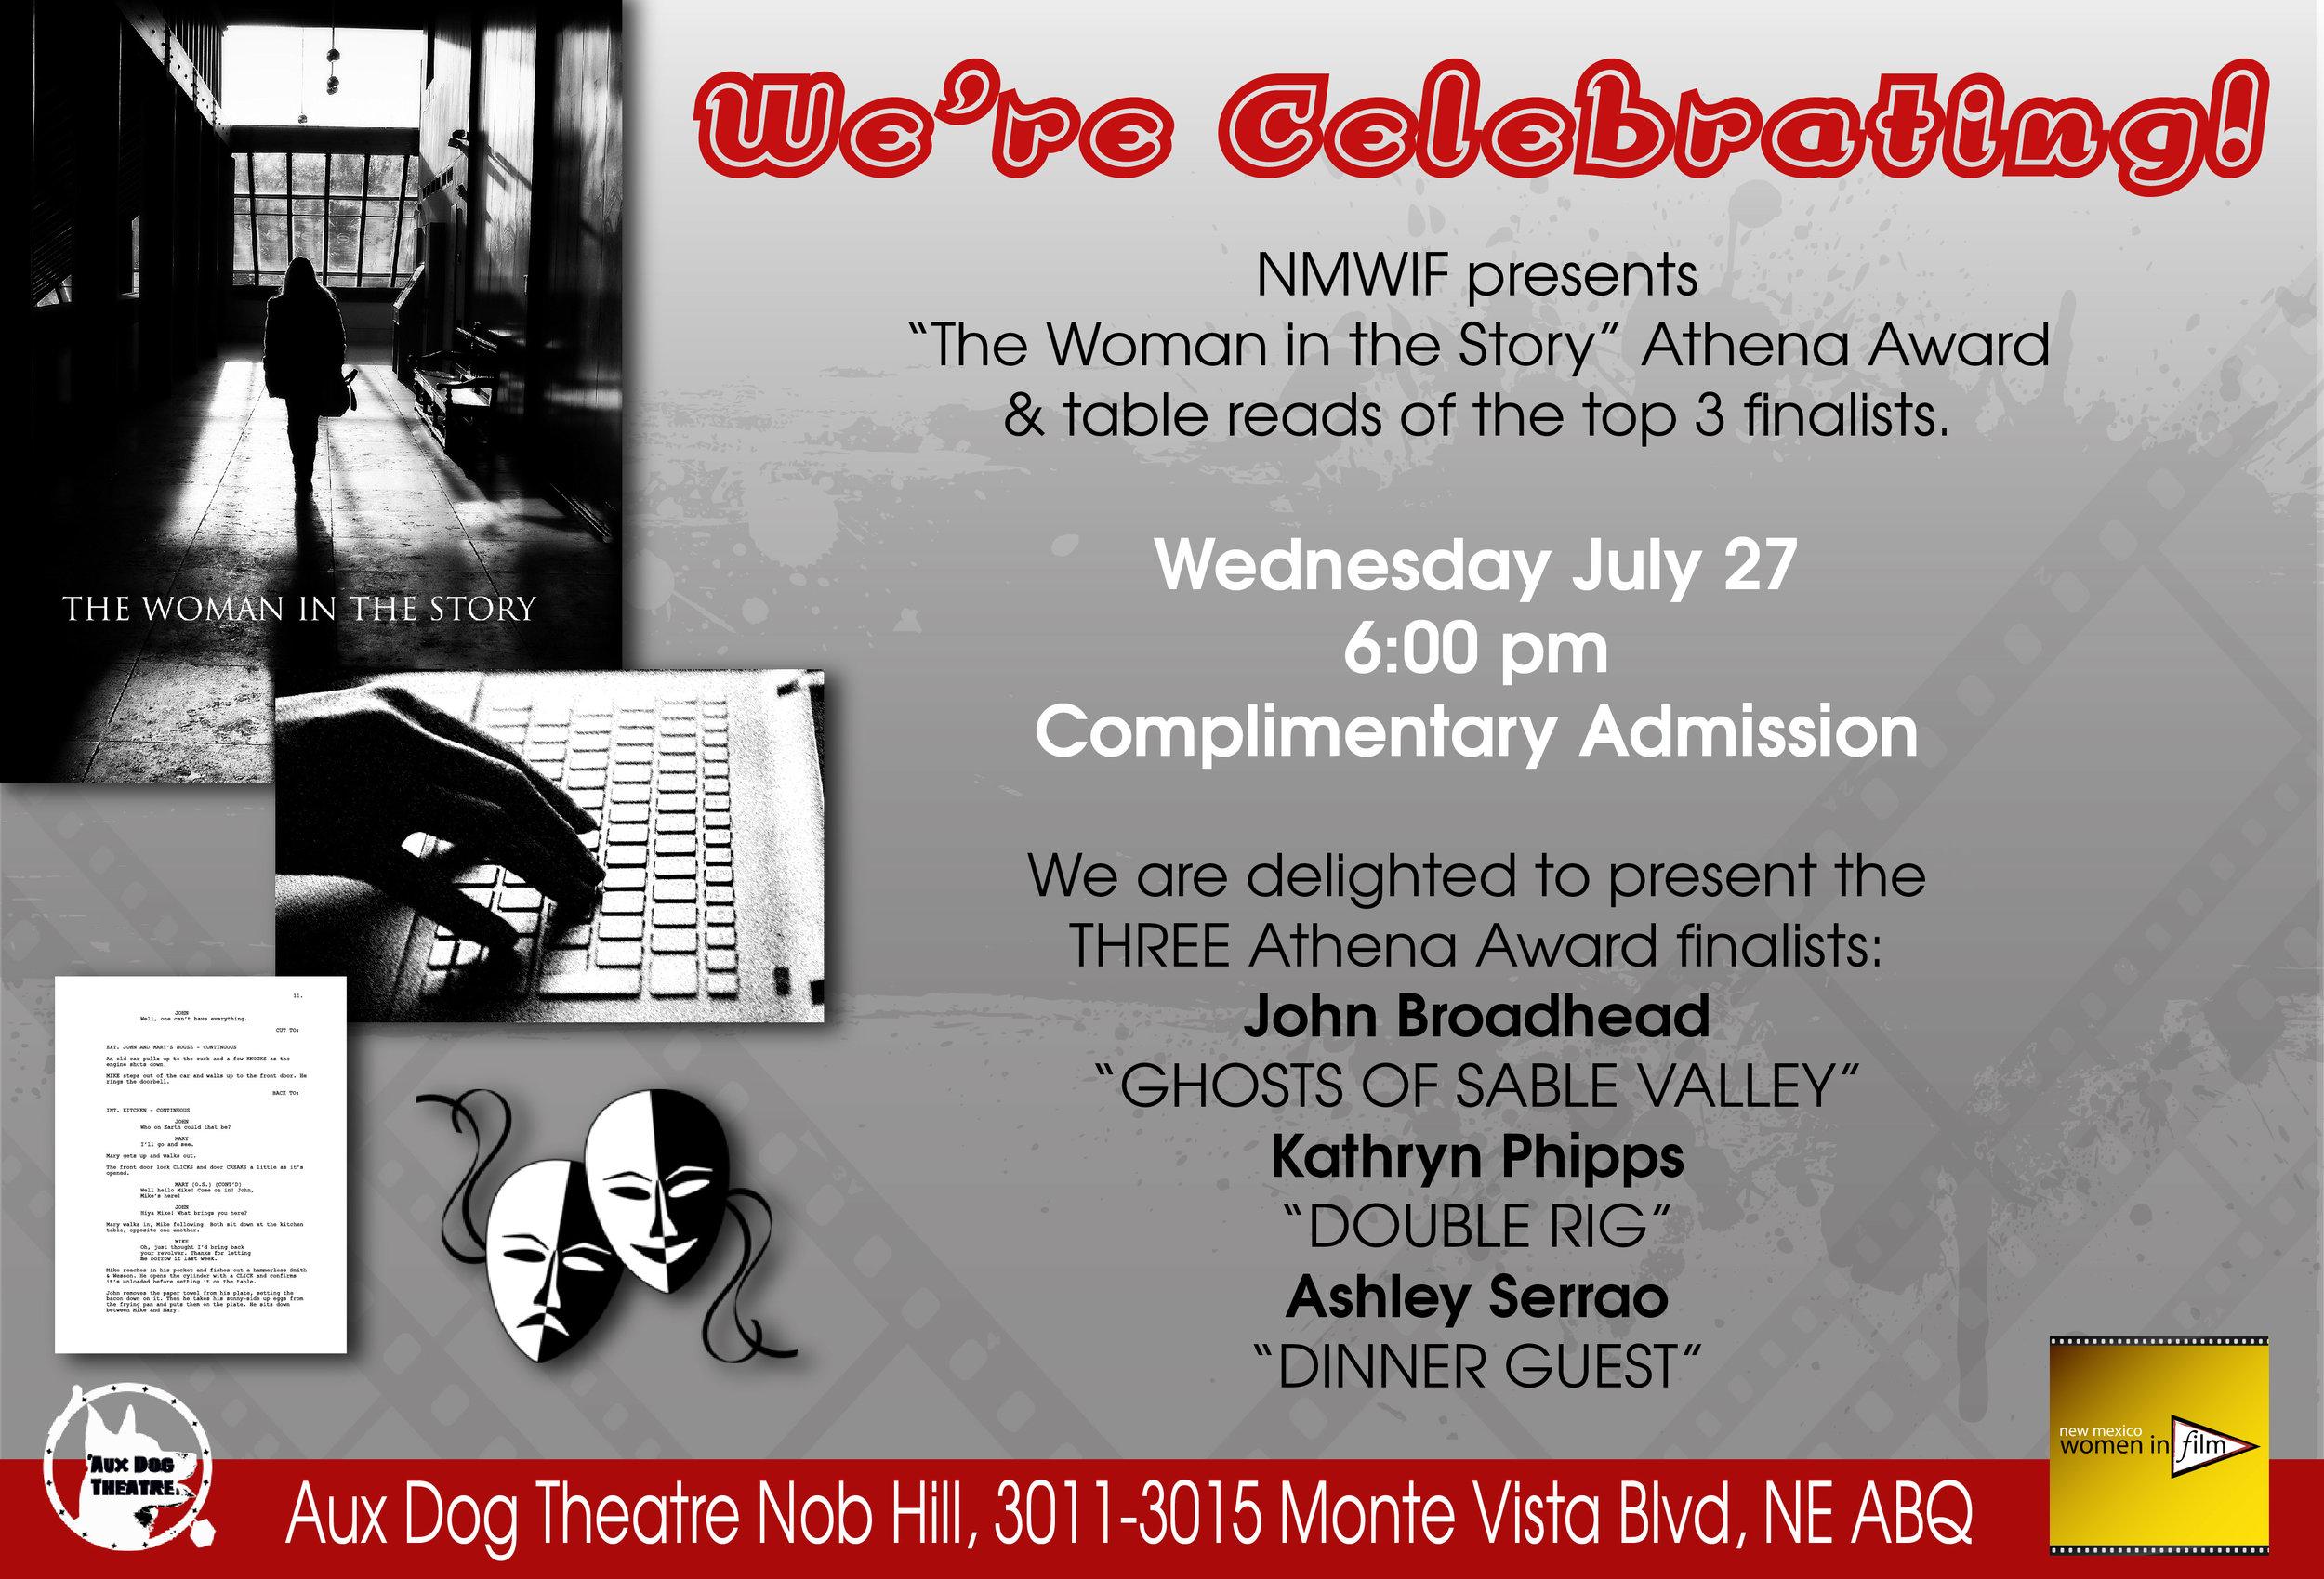 july event flyer2_070316-01.jpg